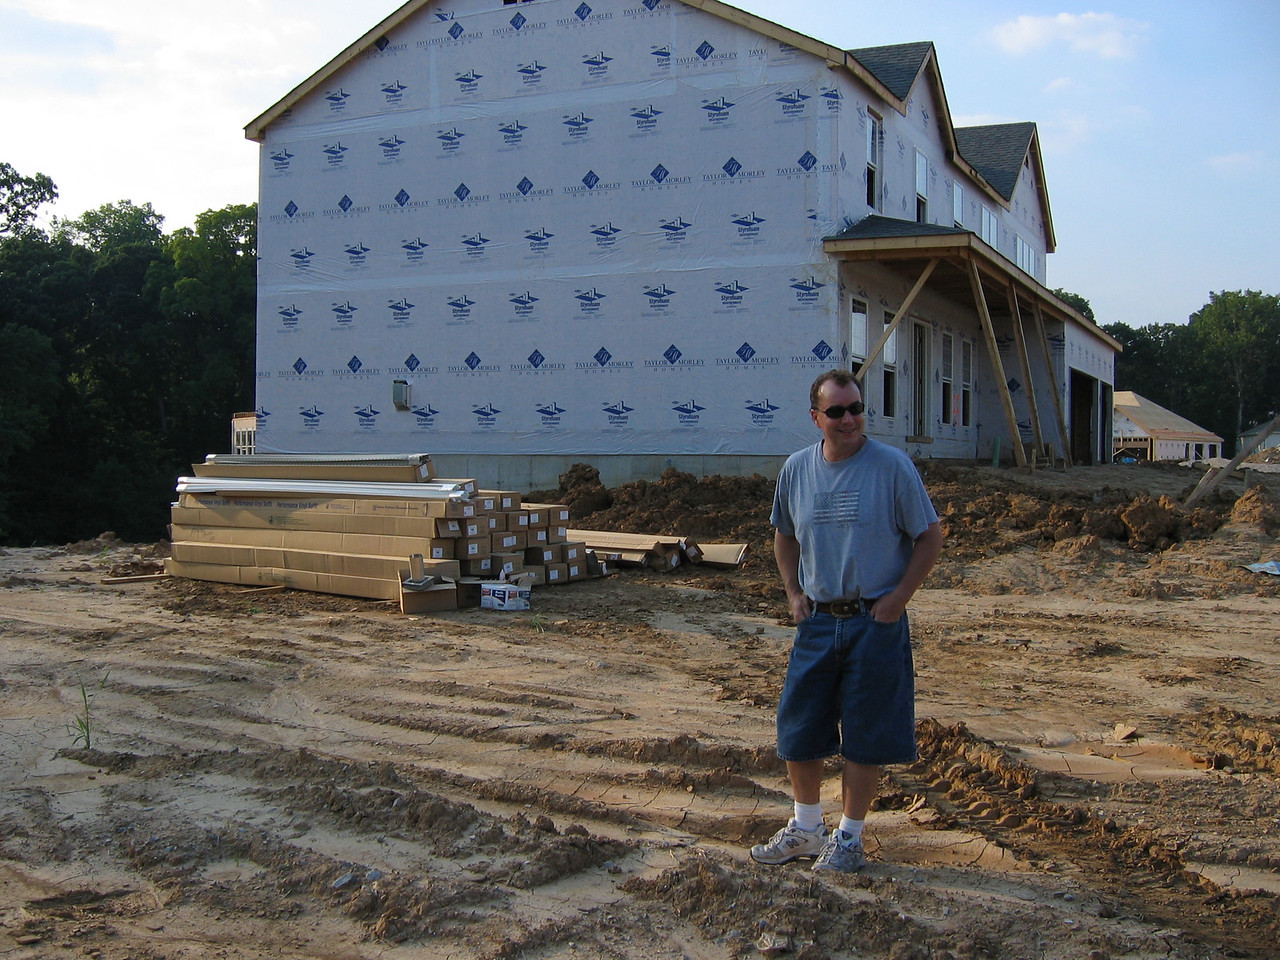 View of Neighbor's House on Right September 04